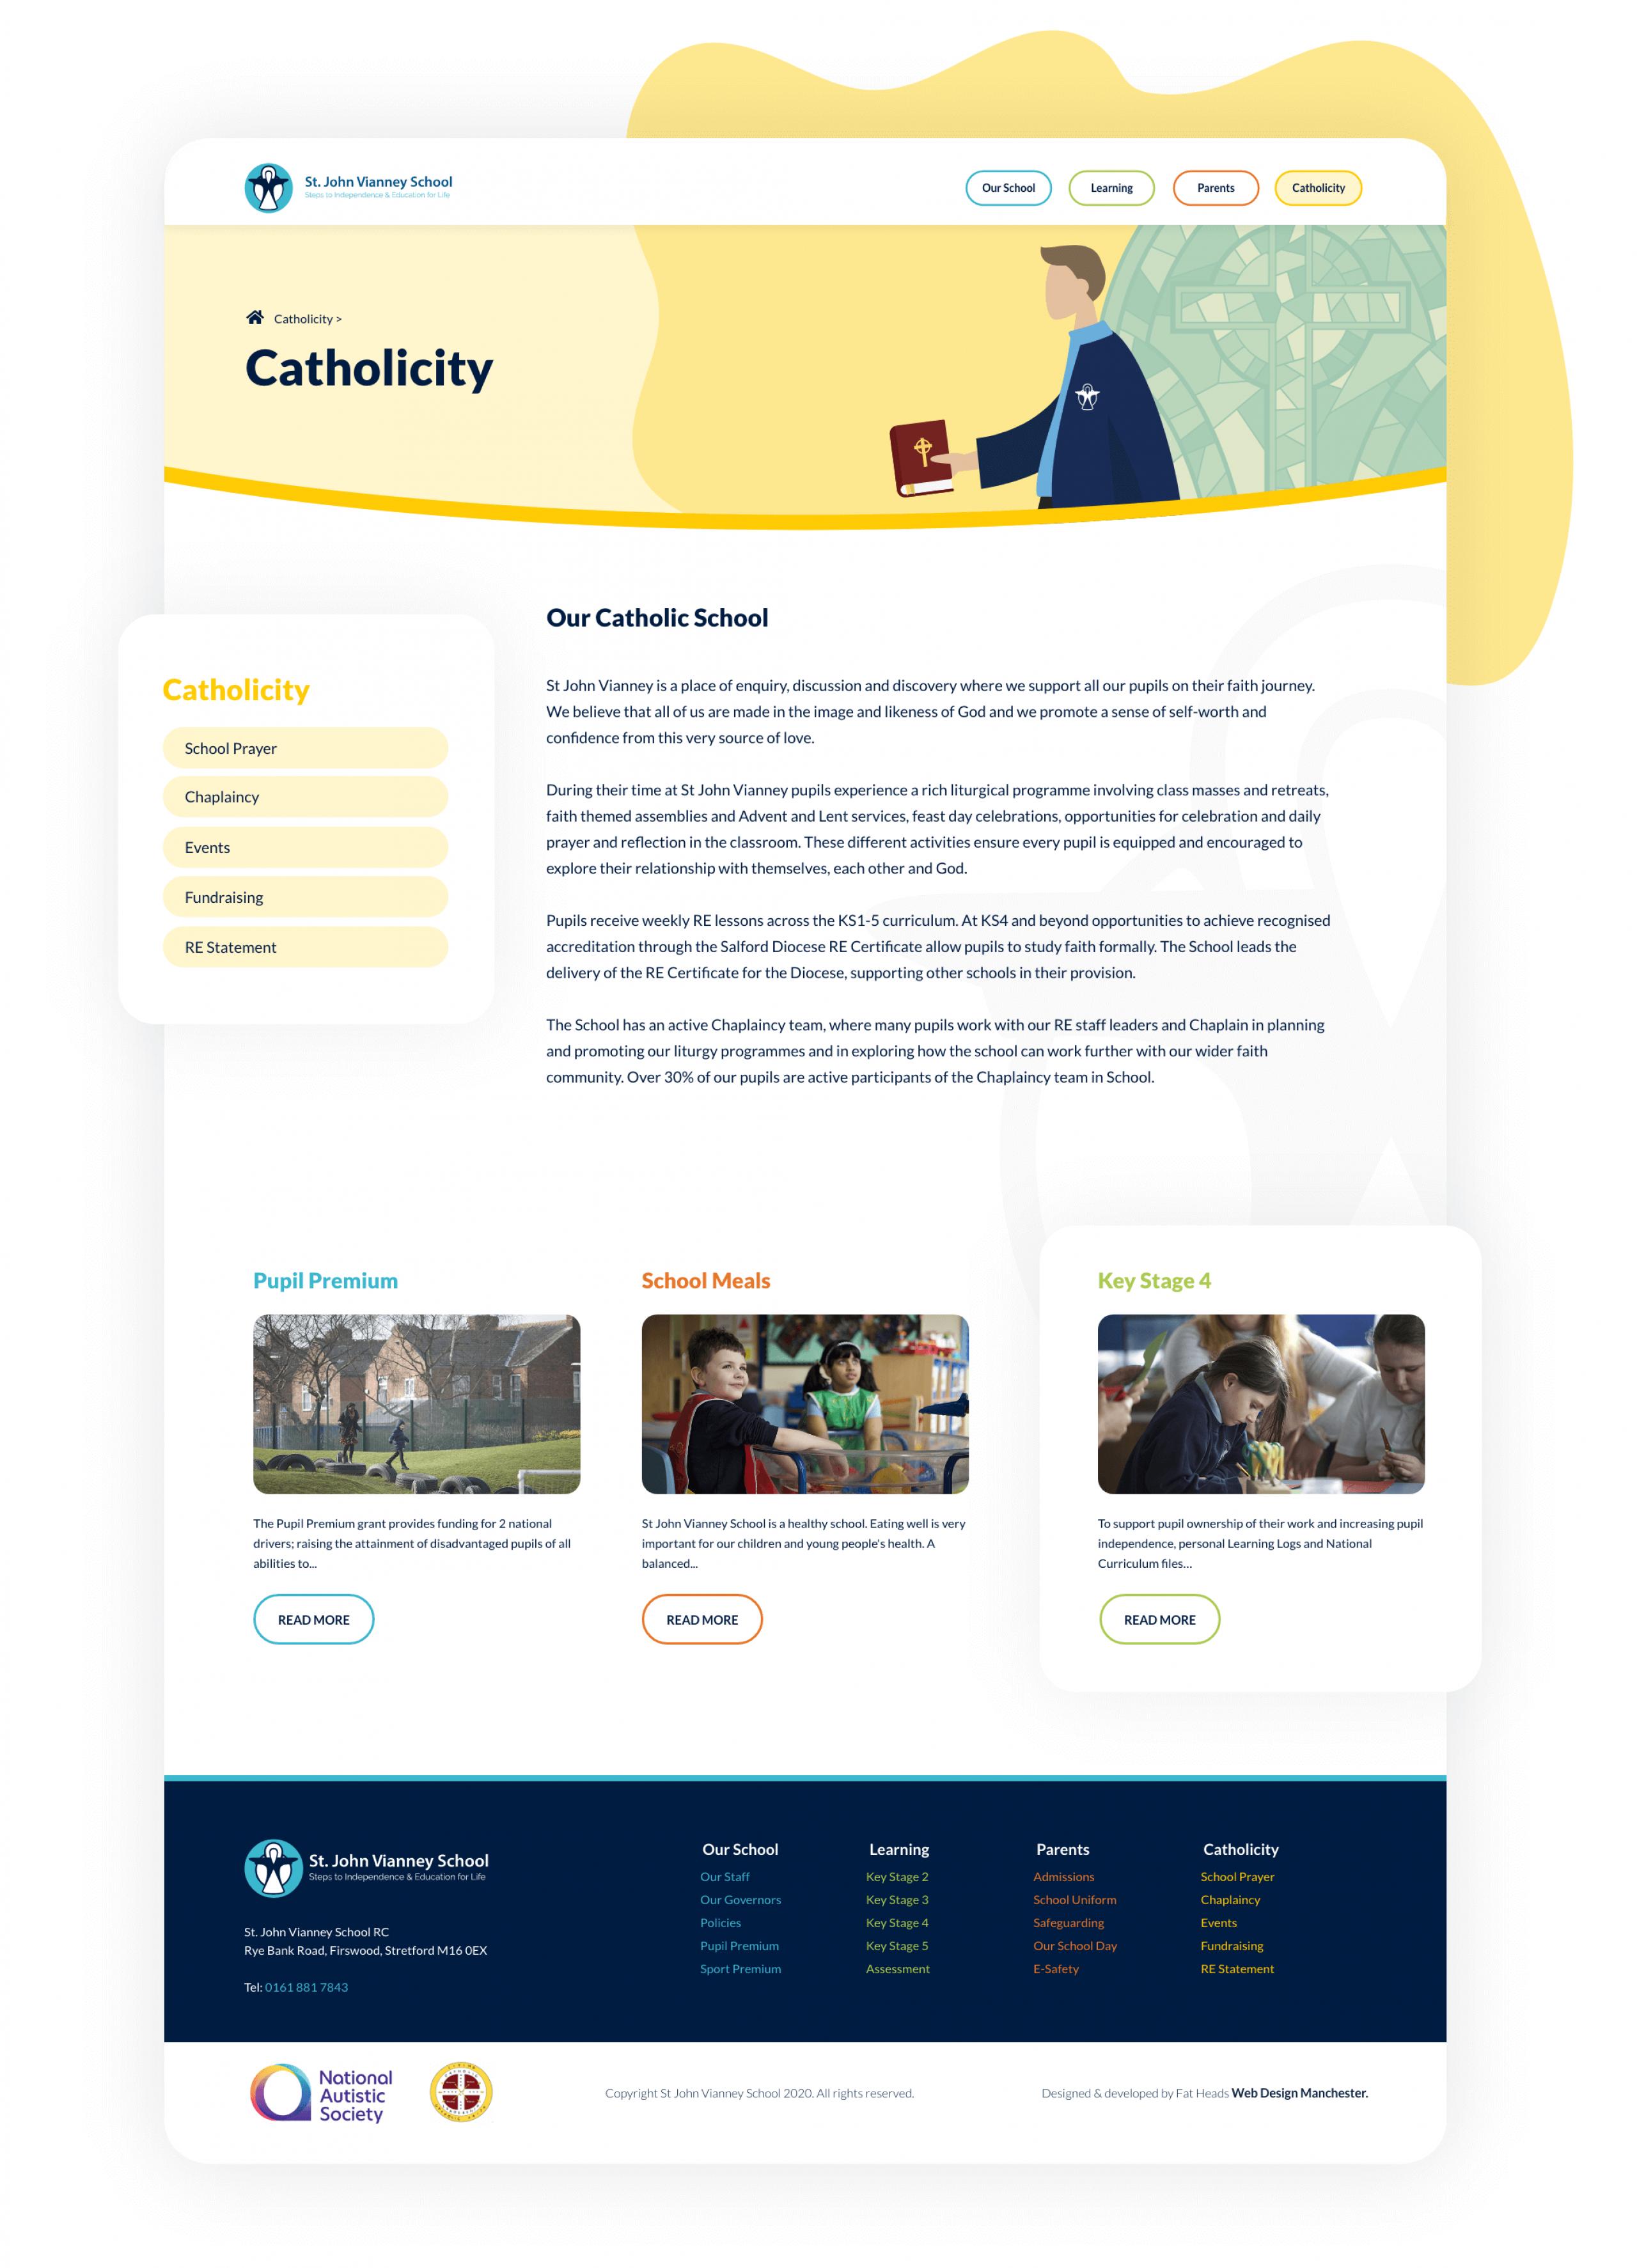 SJV website page